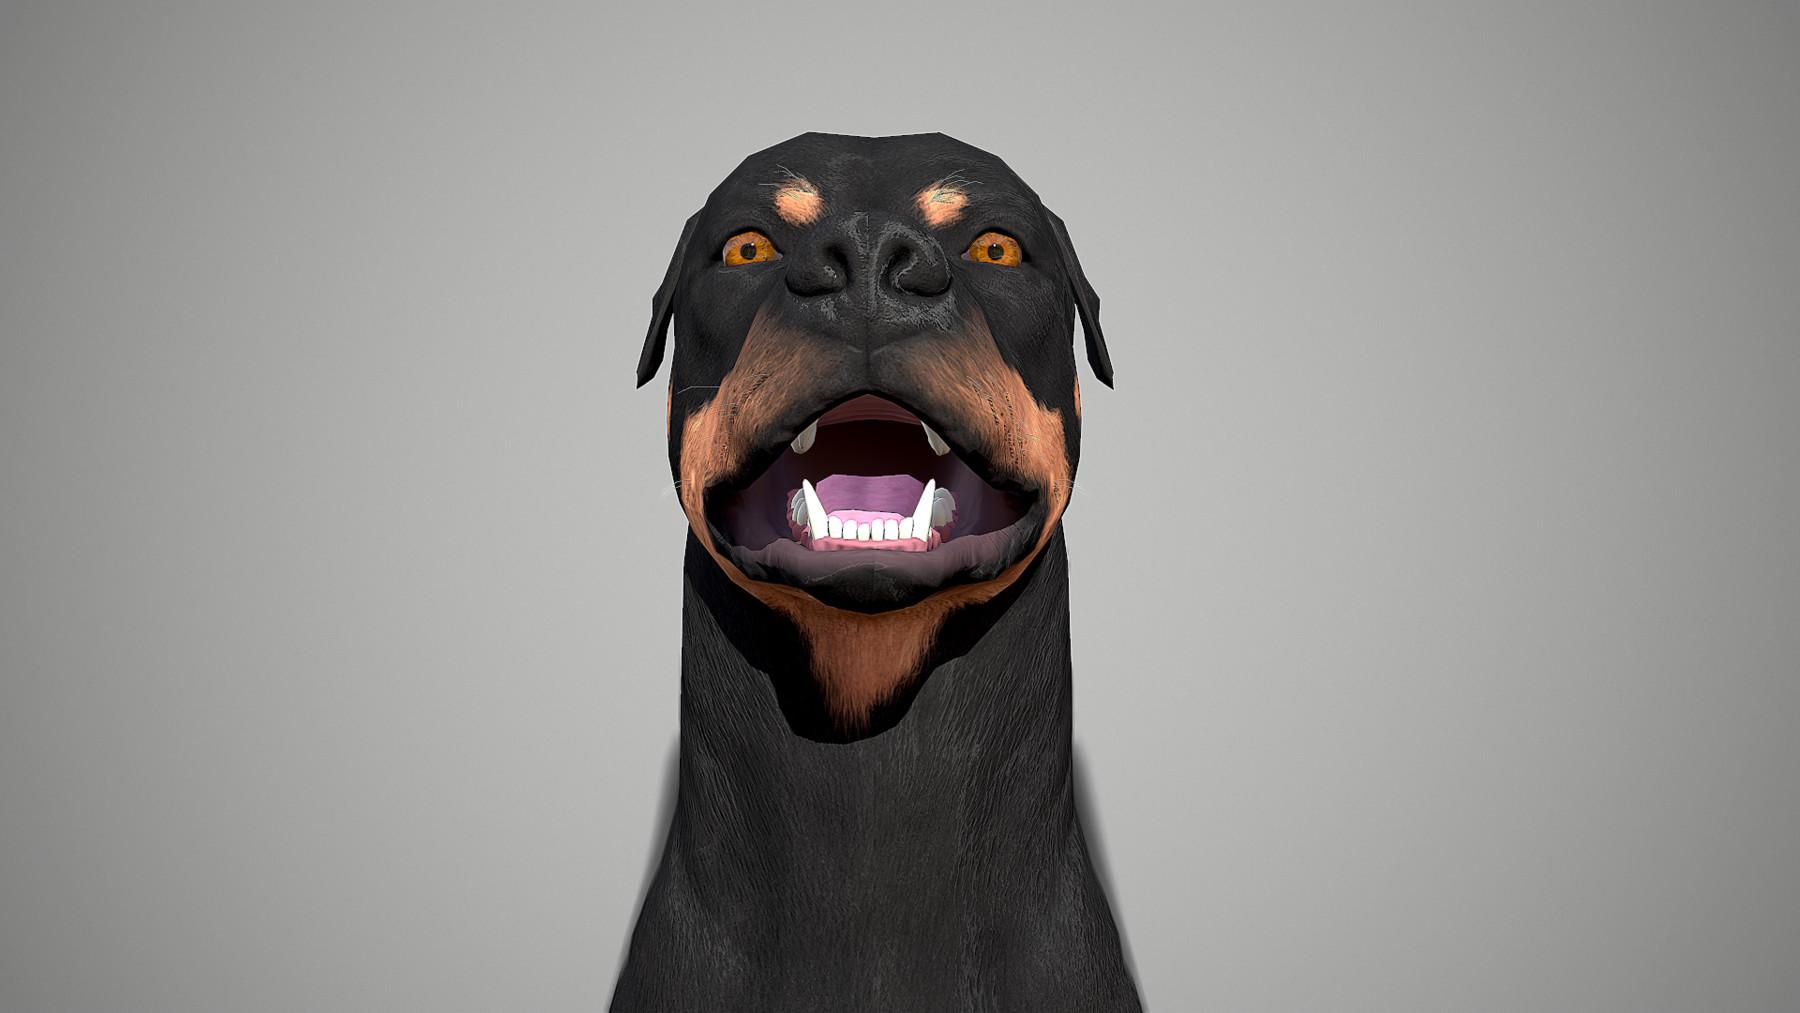 Rottweiler by alexlashko marmoset 15